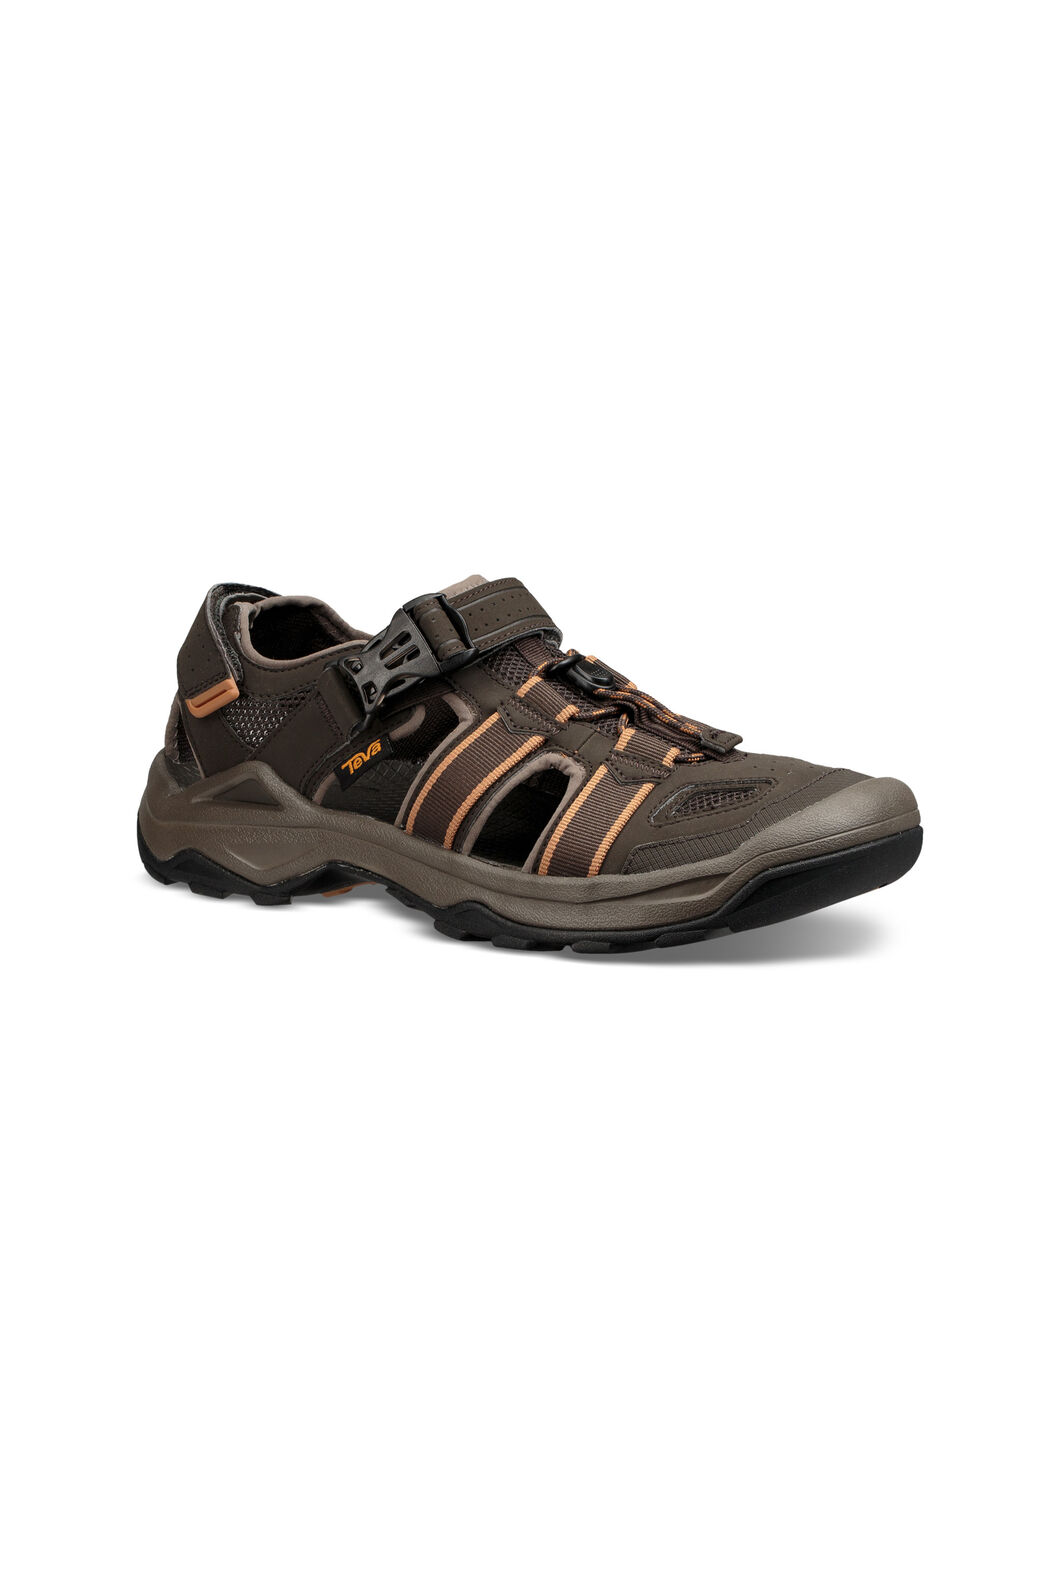 Teva Omnium 2 Closed-Toe Sandals — Men's, Black Olive, hi-res